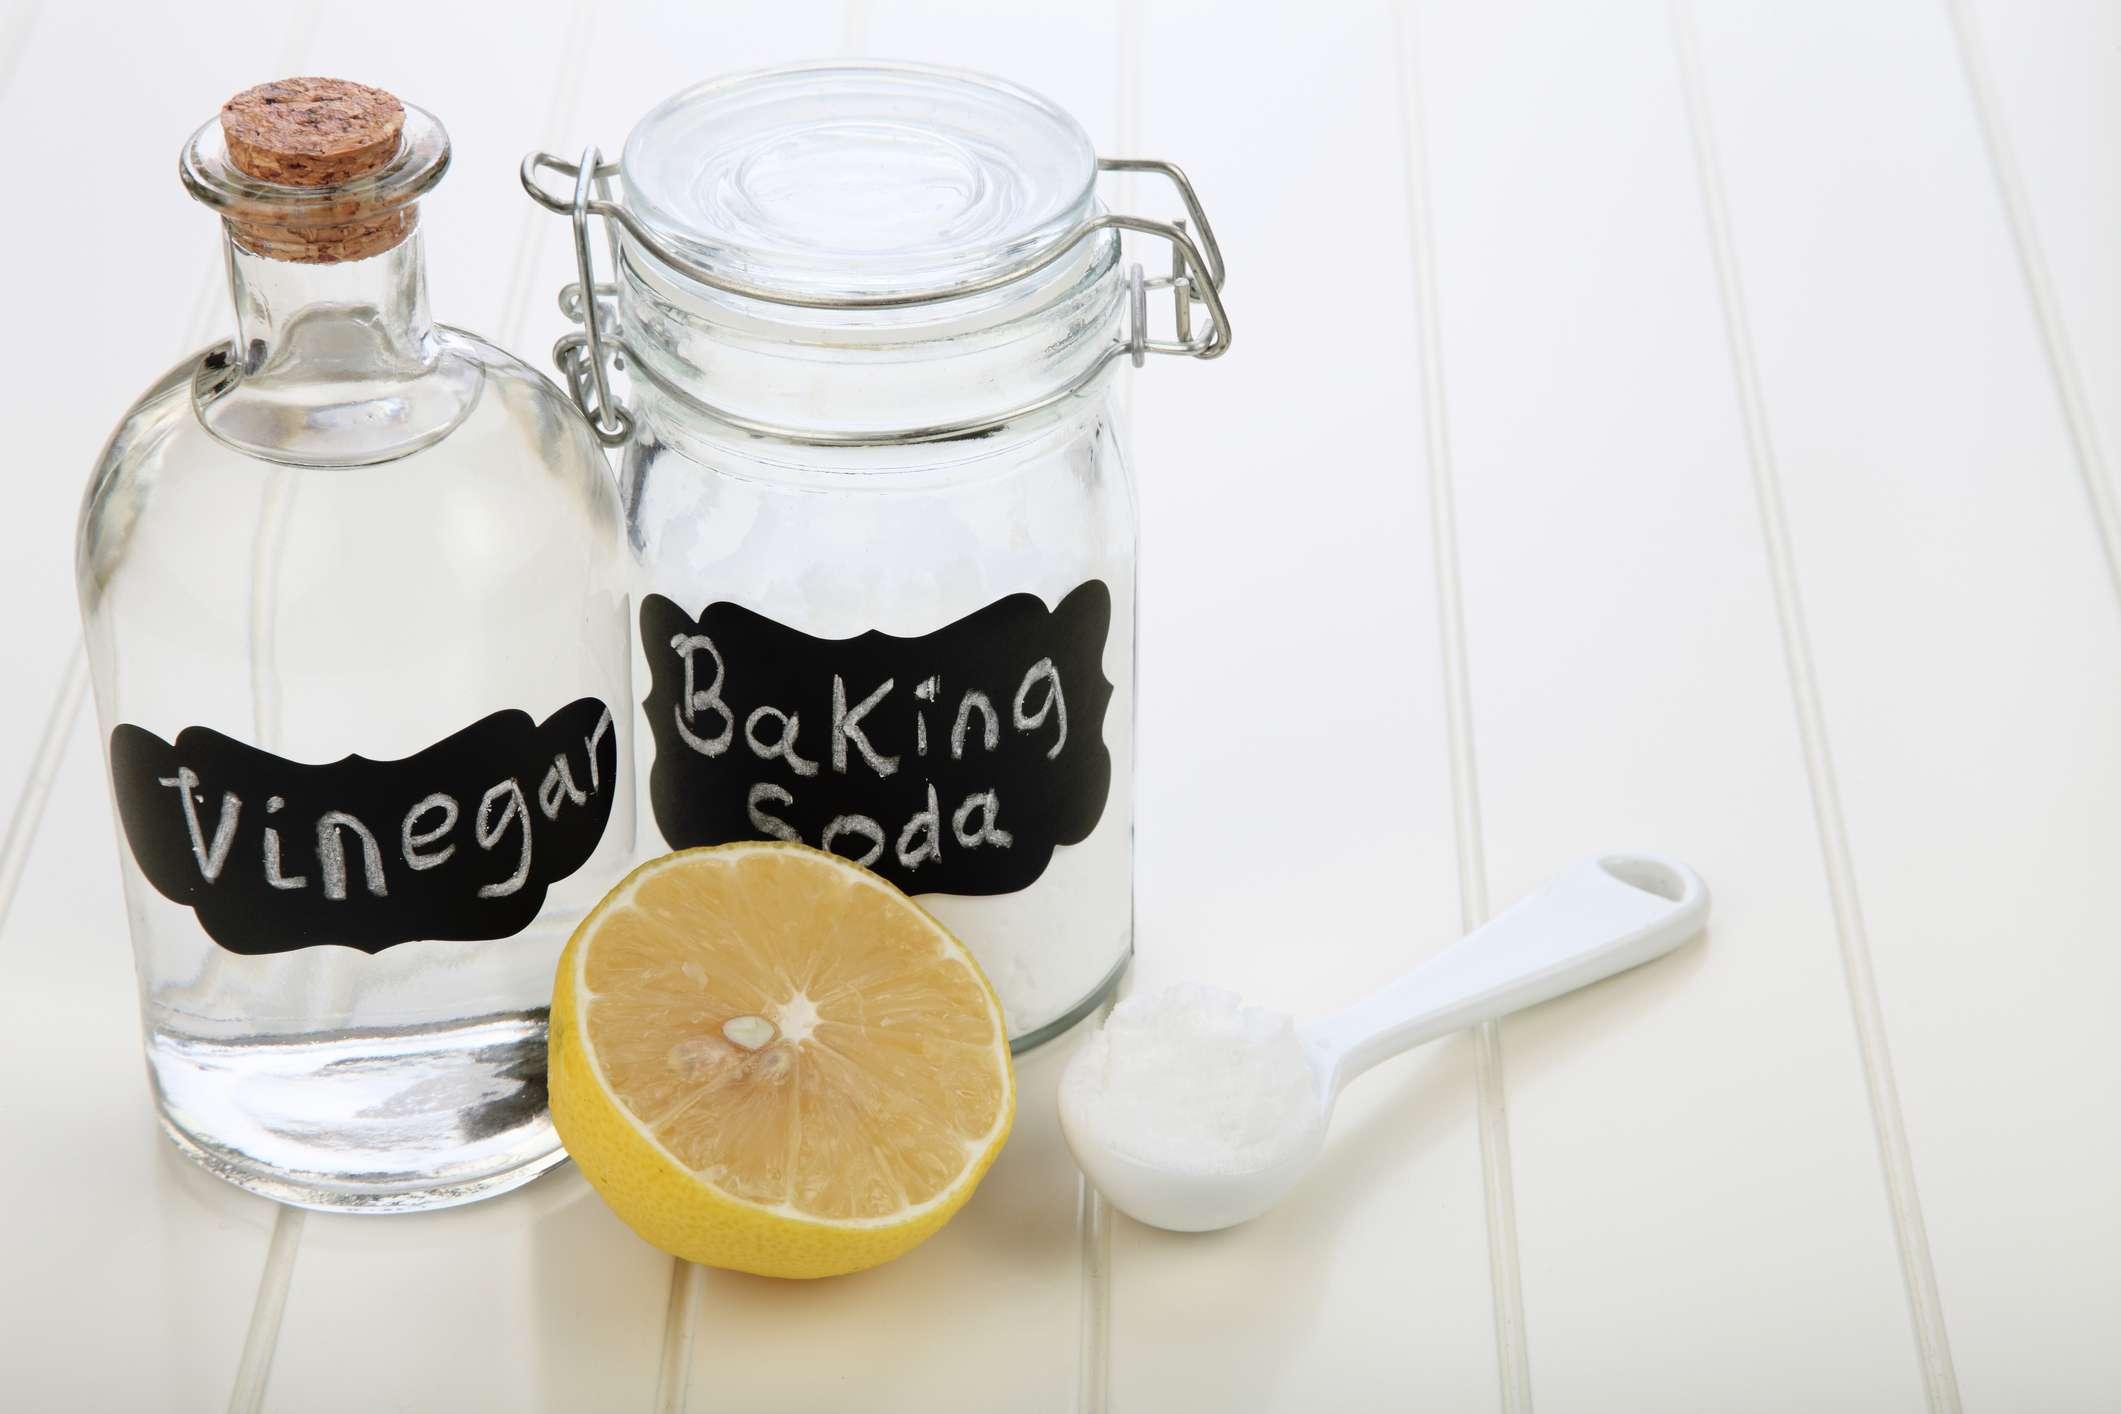 Vinegar, baking soda and lemon on a table